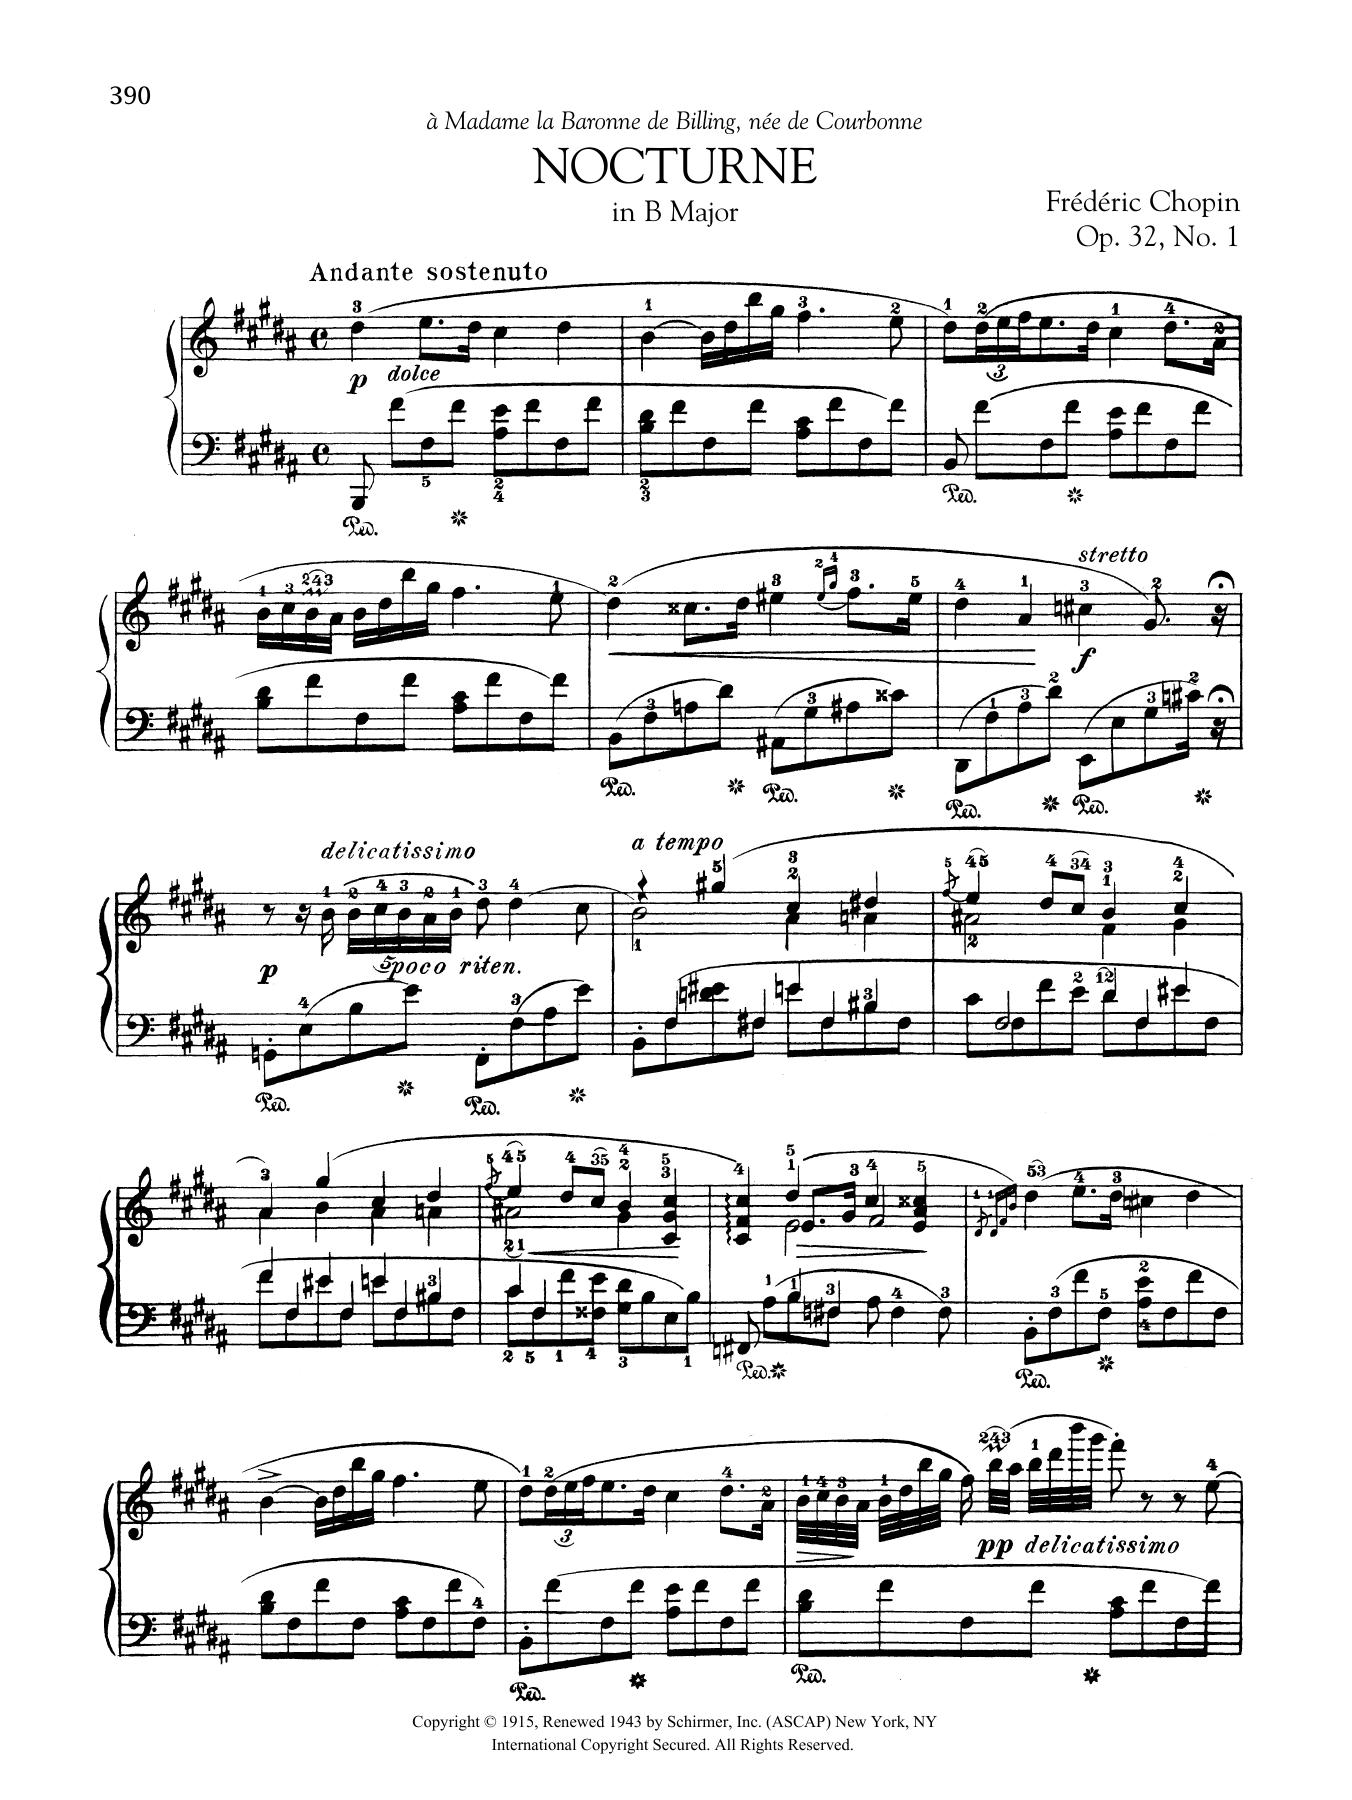 Nocturne in B Major, Op. 32, No. 1 Sheet Music